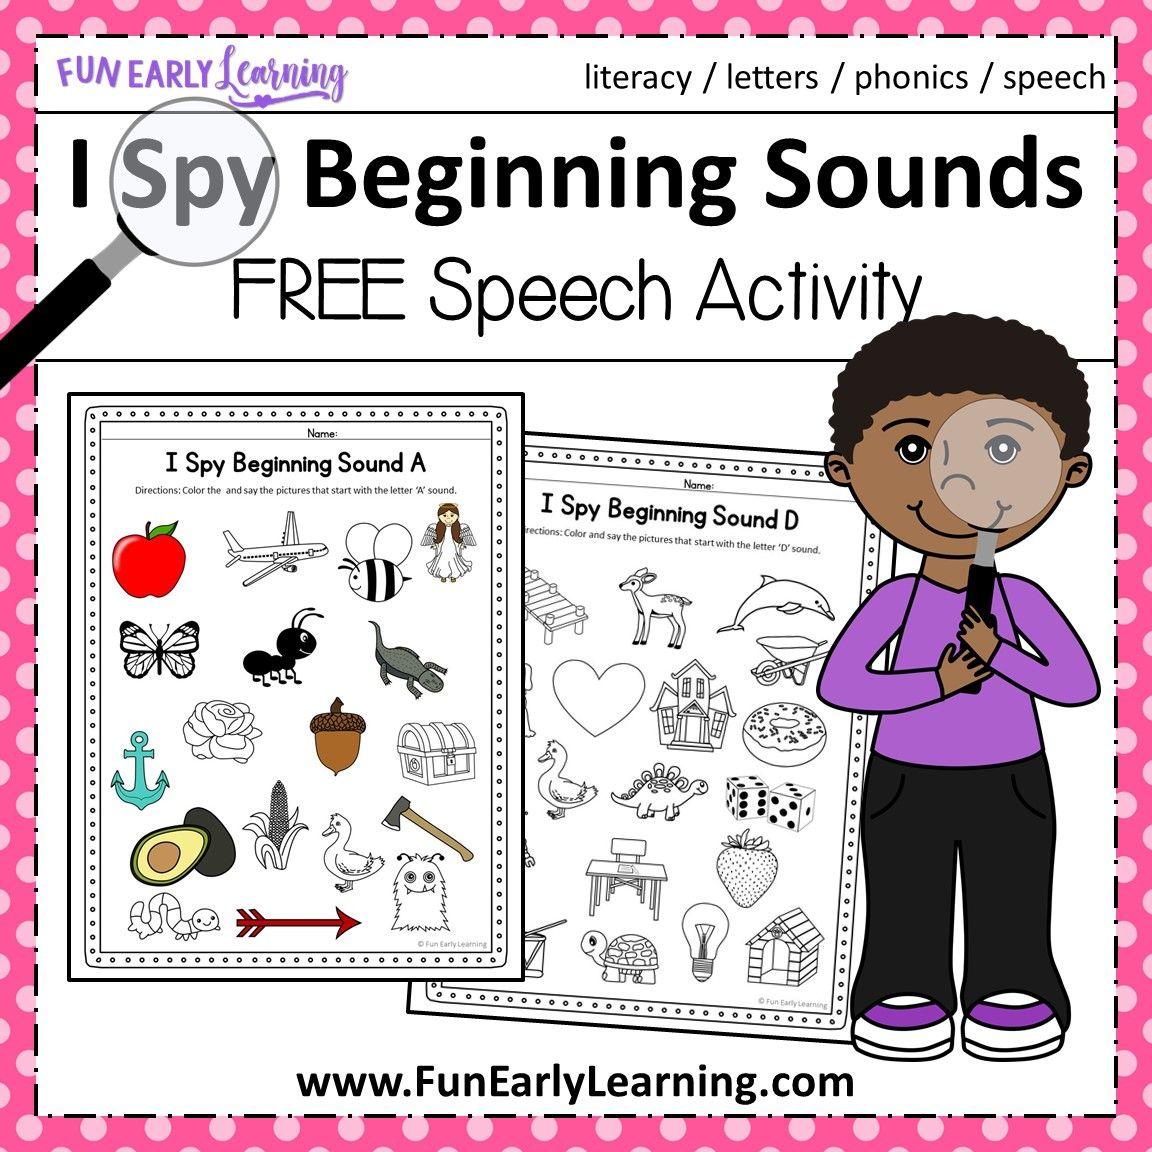 I Spy Beginning Sounds